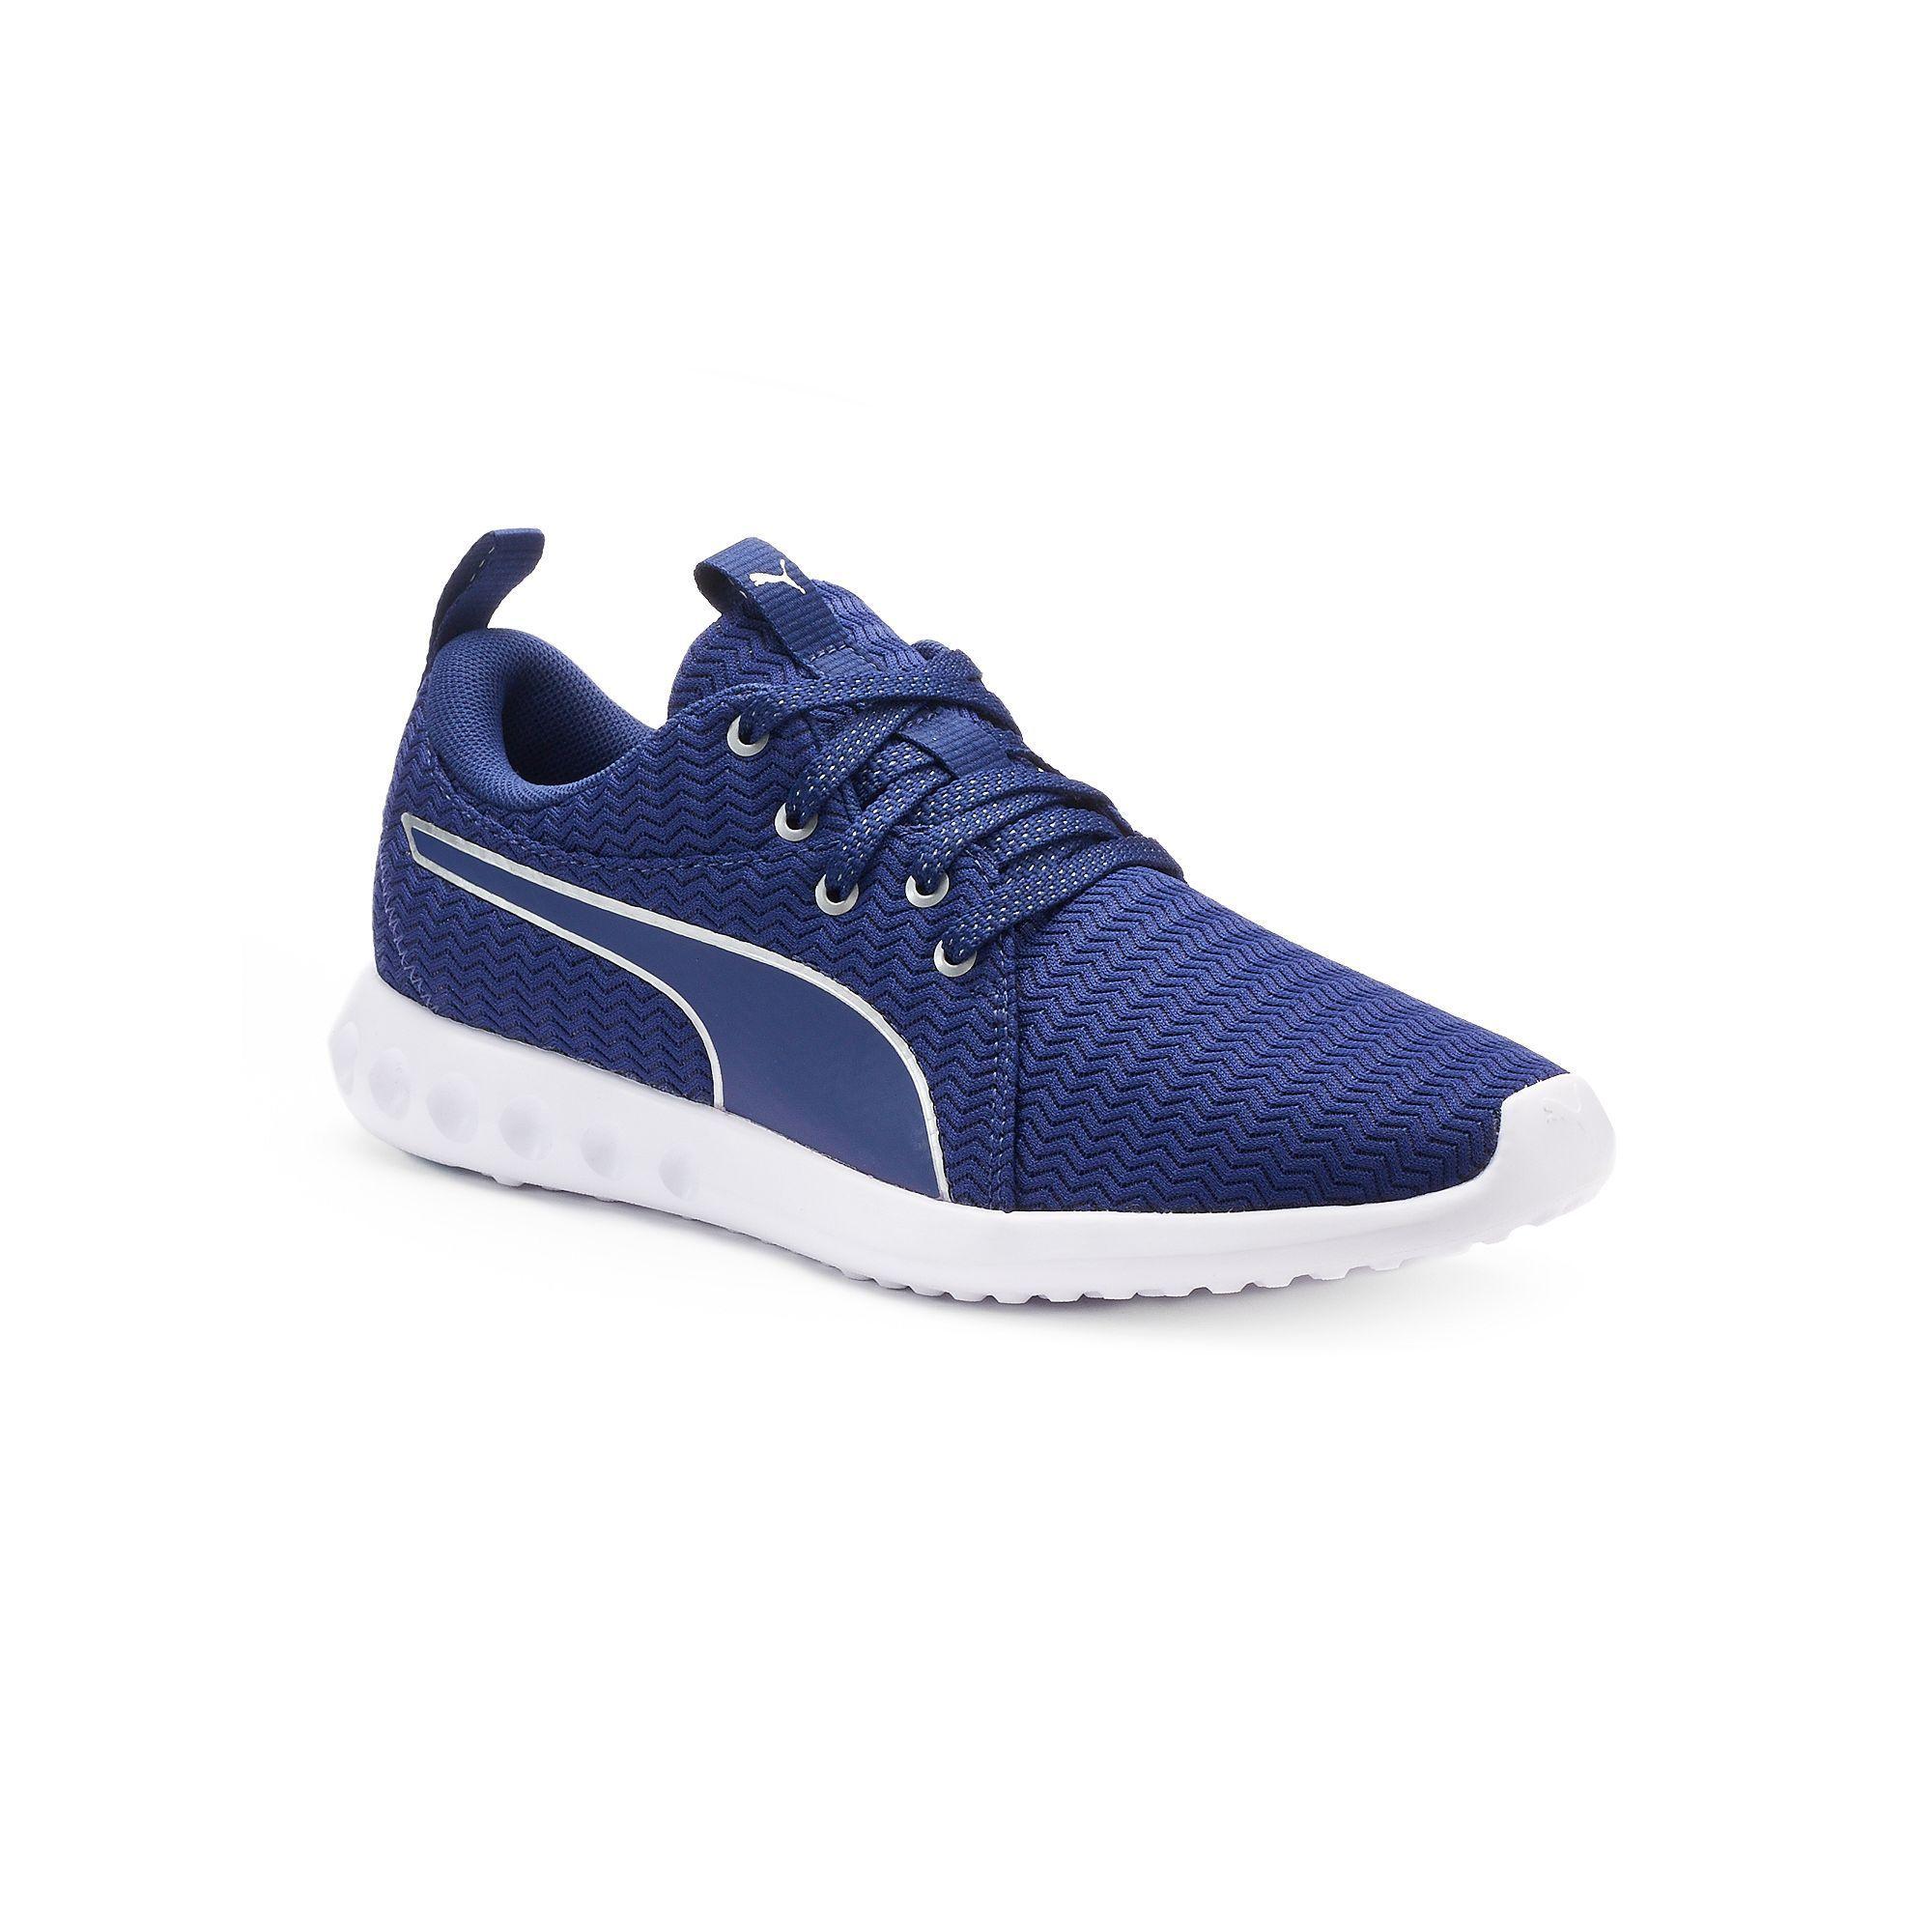 PUMA Carson 2 Metallic Women's Running Sneakers, Size: 7.5, ...